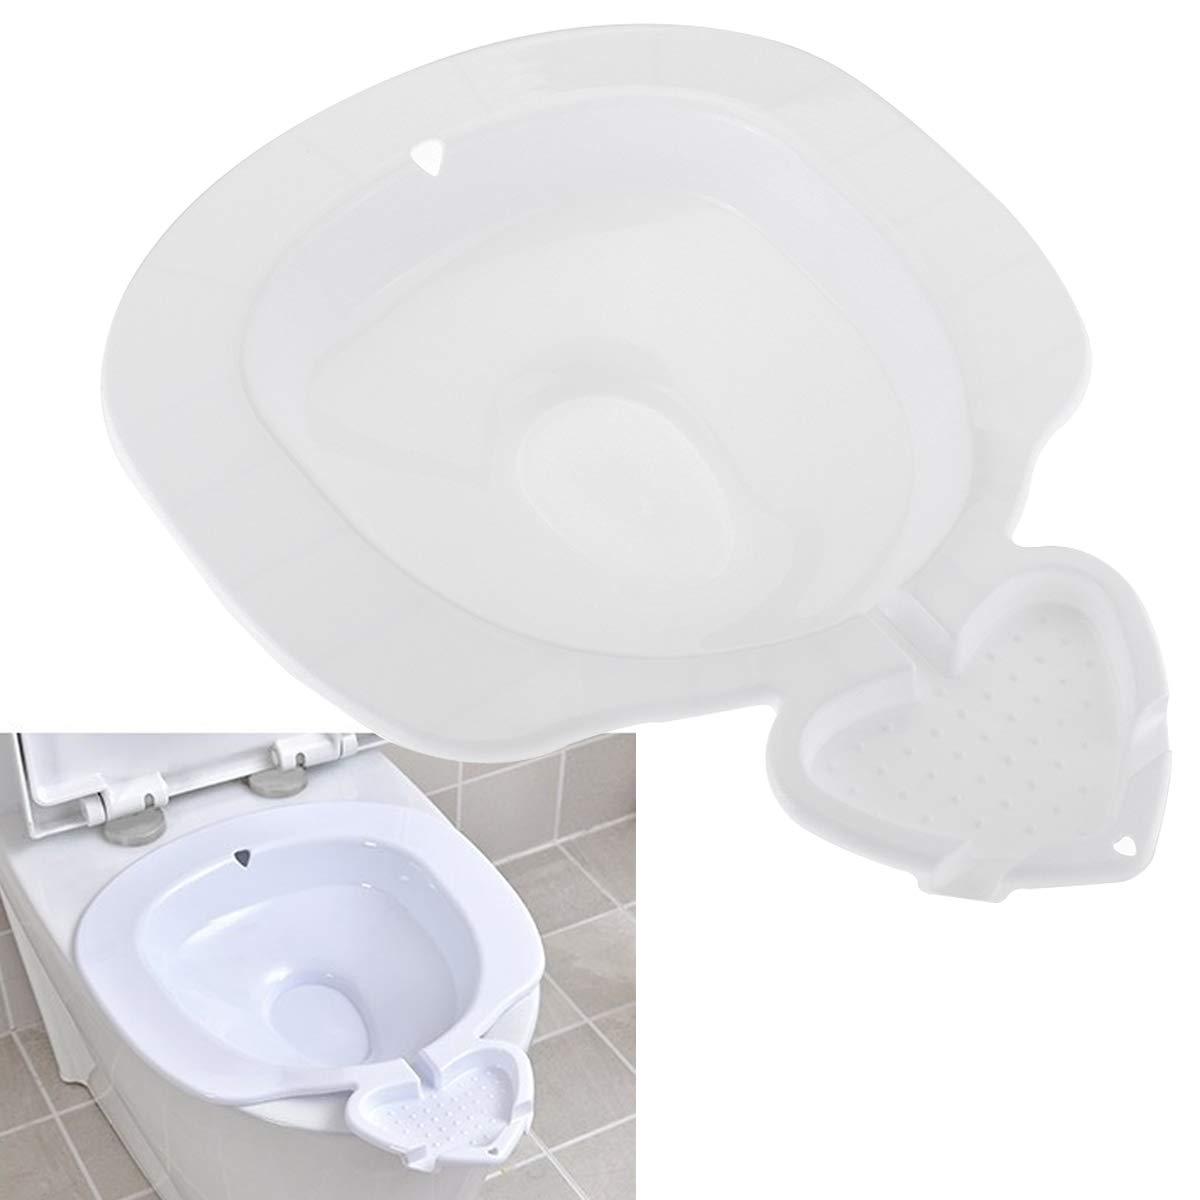 Portable Plastic Bidet,Sorrliva Portable Travel Toilet Bidet Personal Hygiene Camping Pregnant Elderly Safe Bath